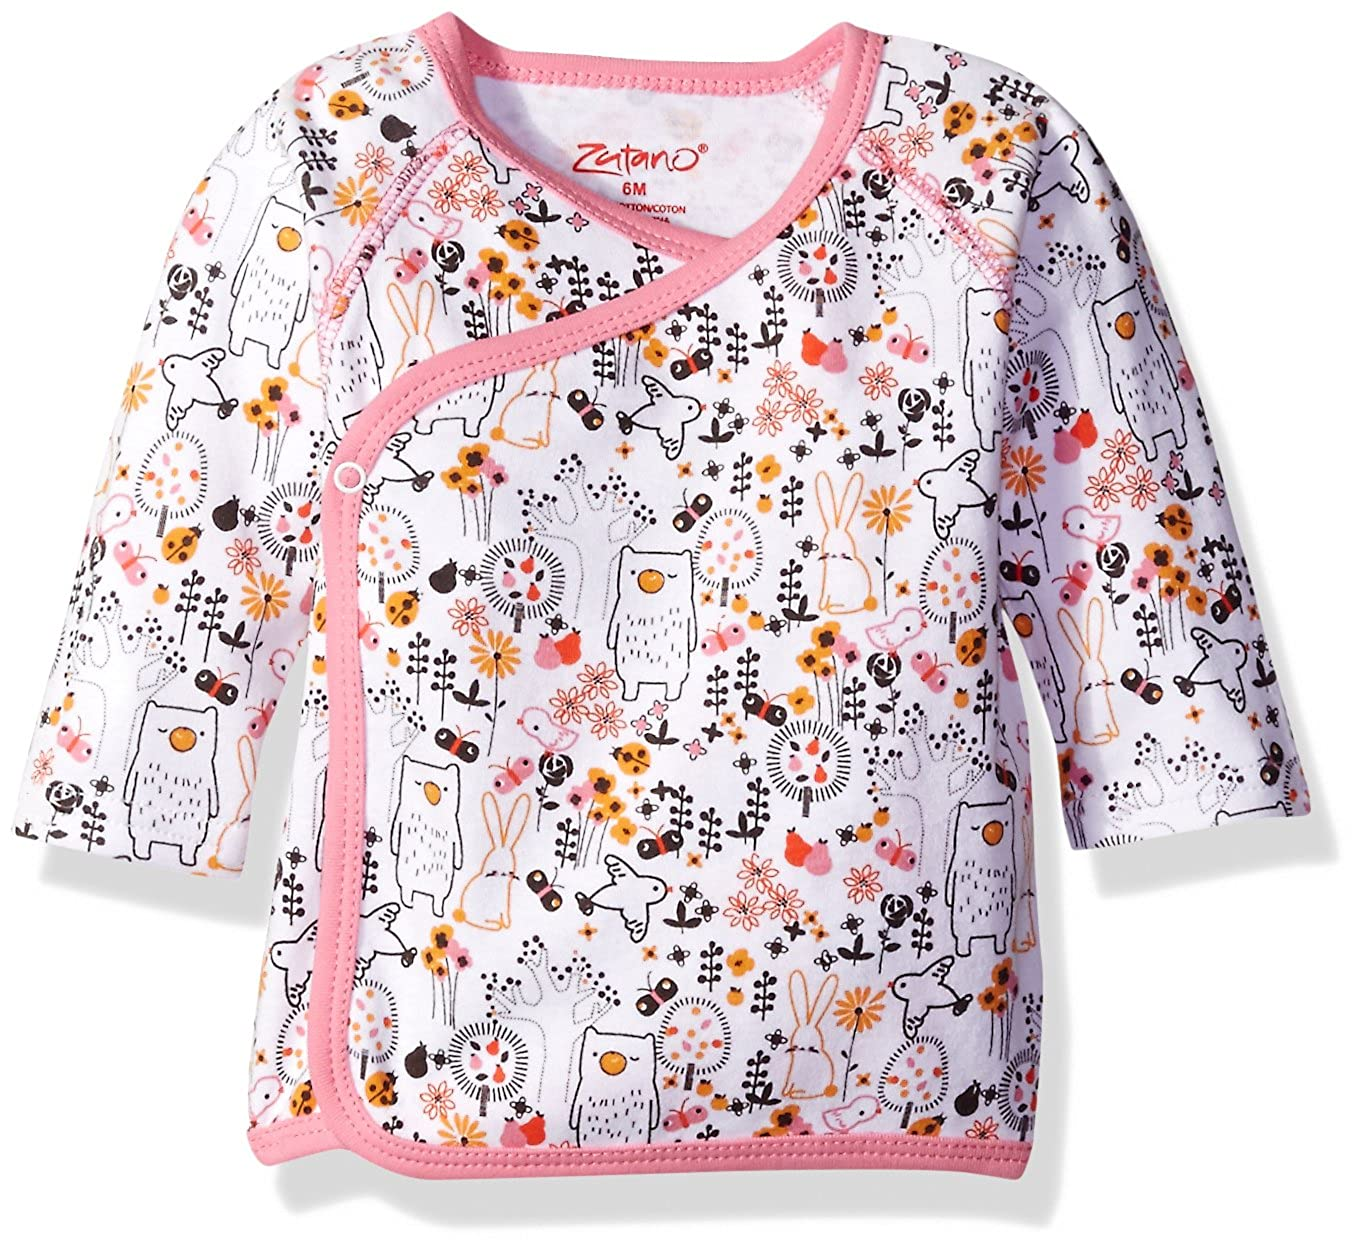 Zutano Unisex Baby Kimono Top